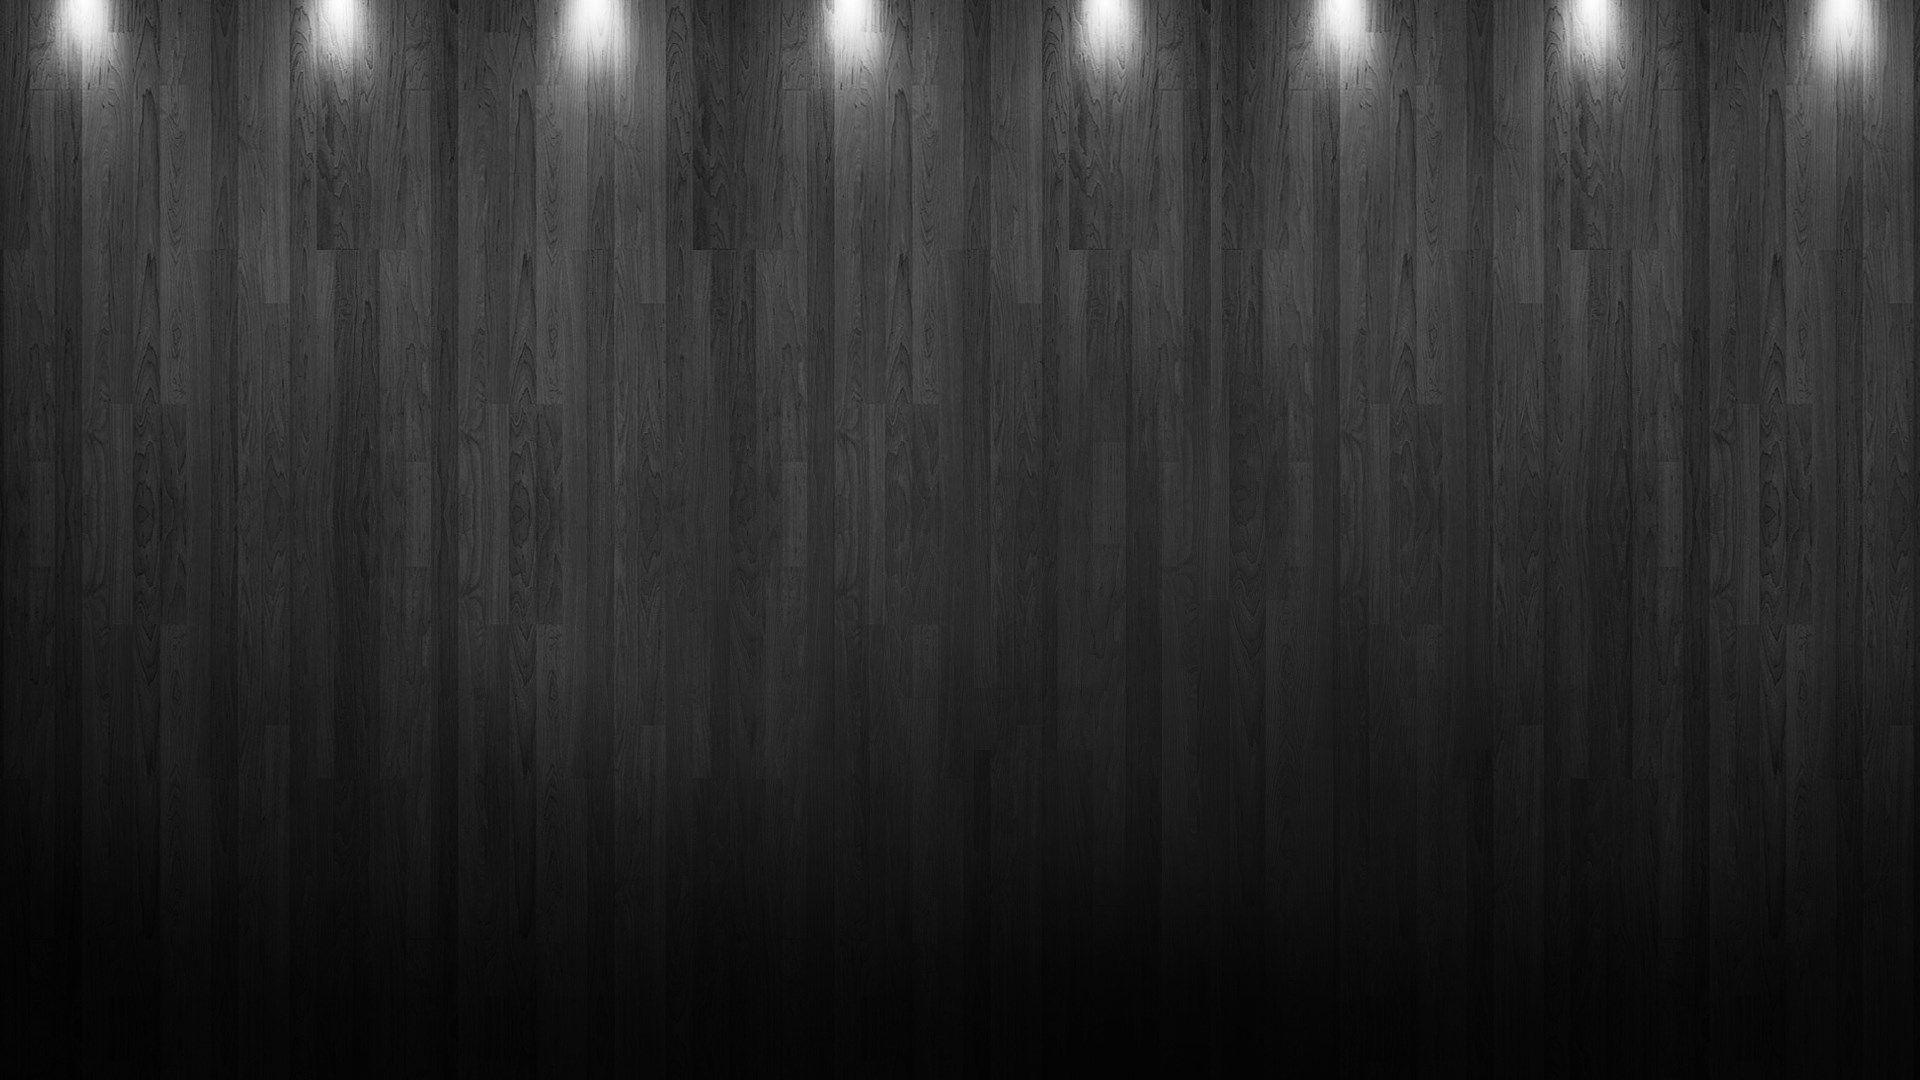 Dark Wood Wallpapers Wallpaper Cave Black Wood Background Dark Wood Wallpaper Wood Texture Background